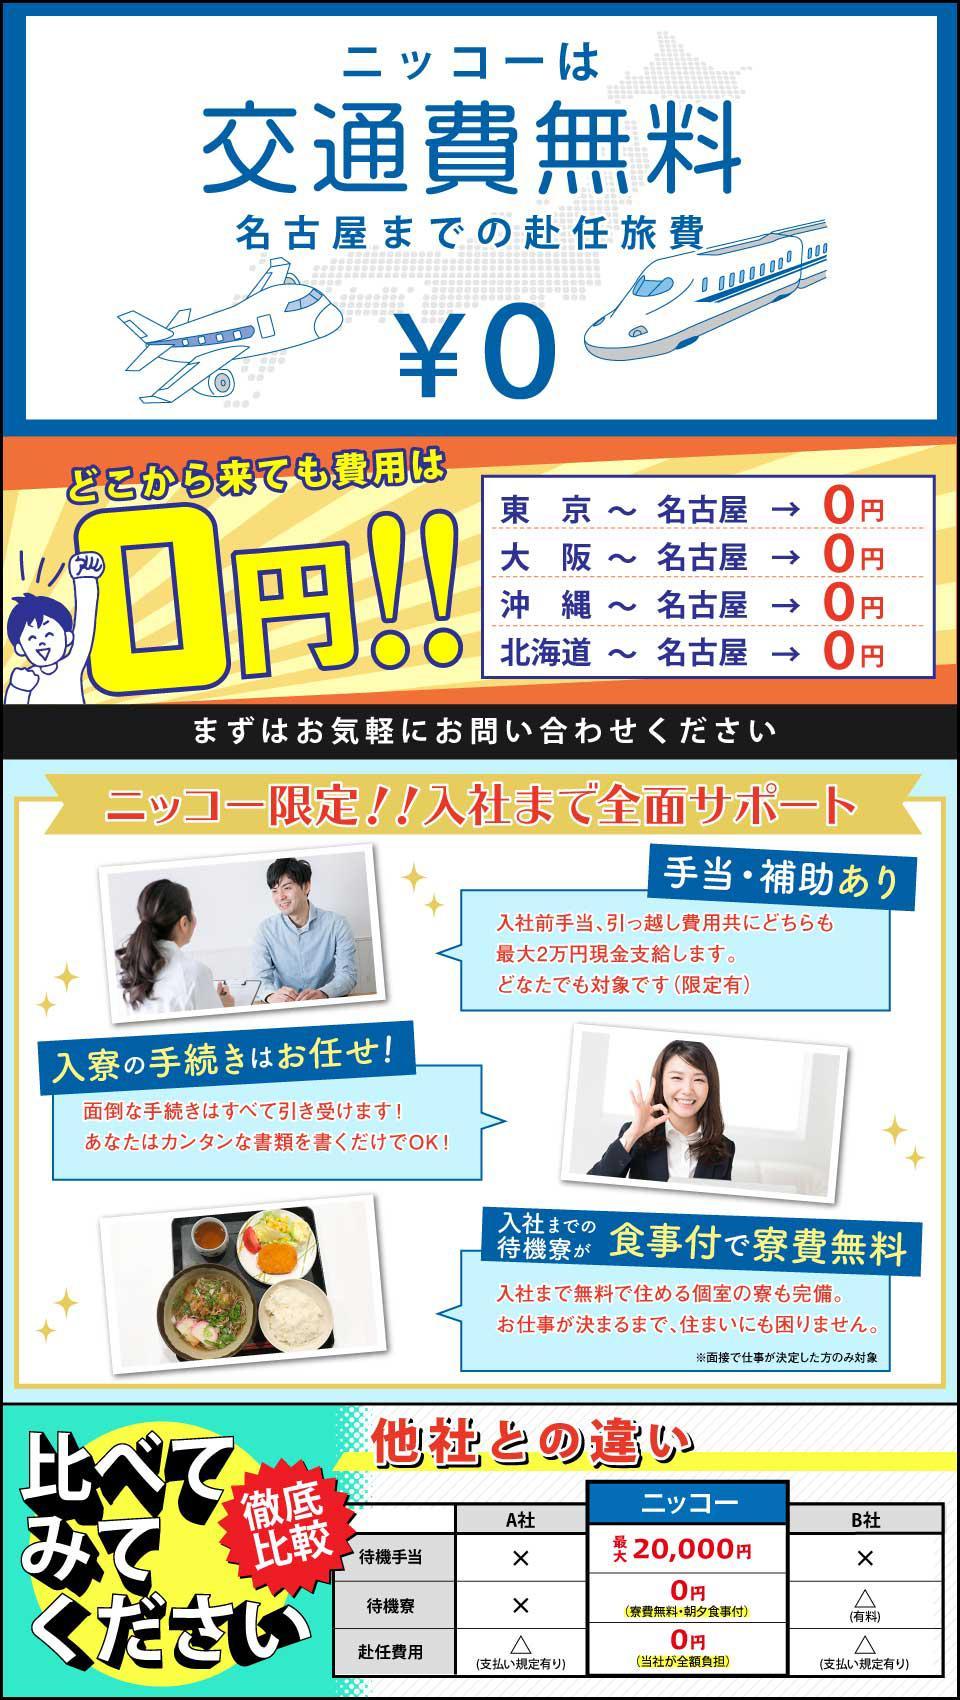 ryohi_jobcon_lp_960_1700A.jpg